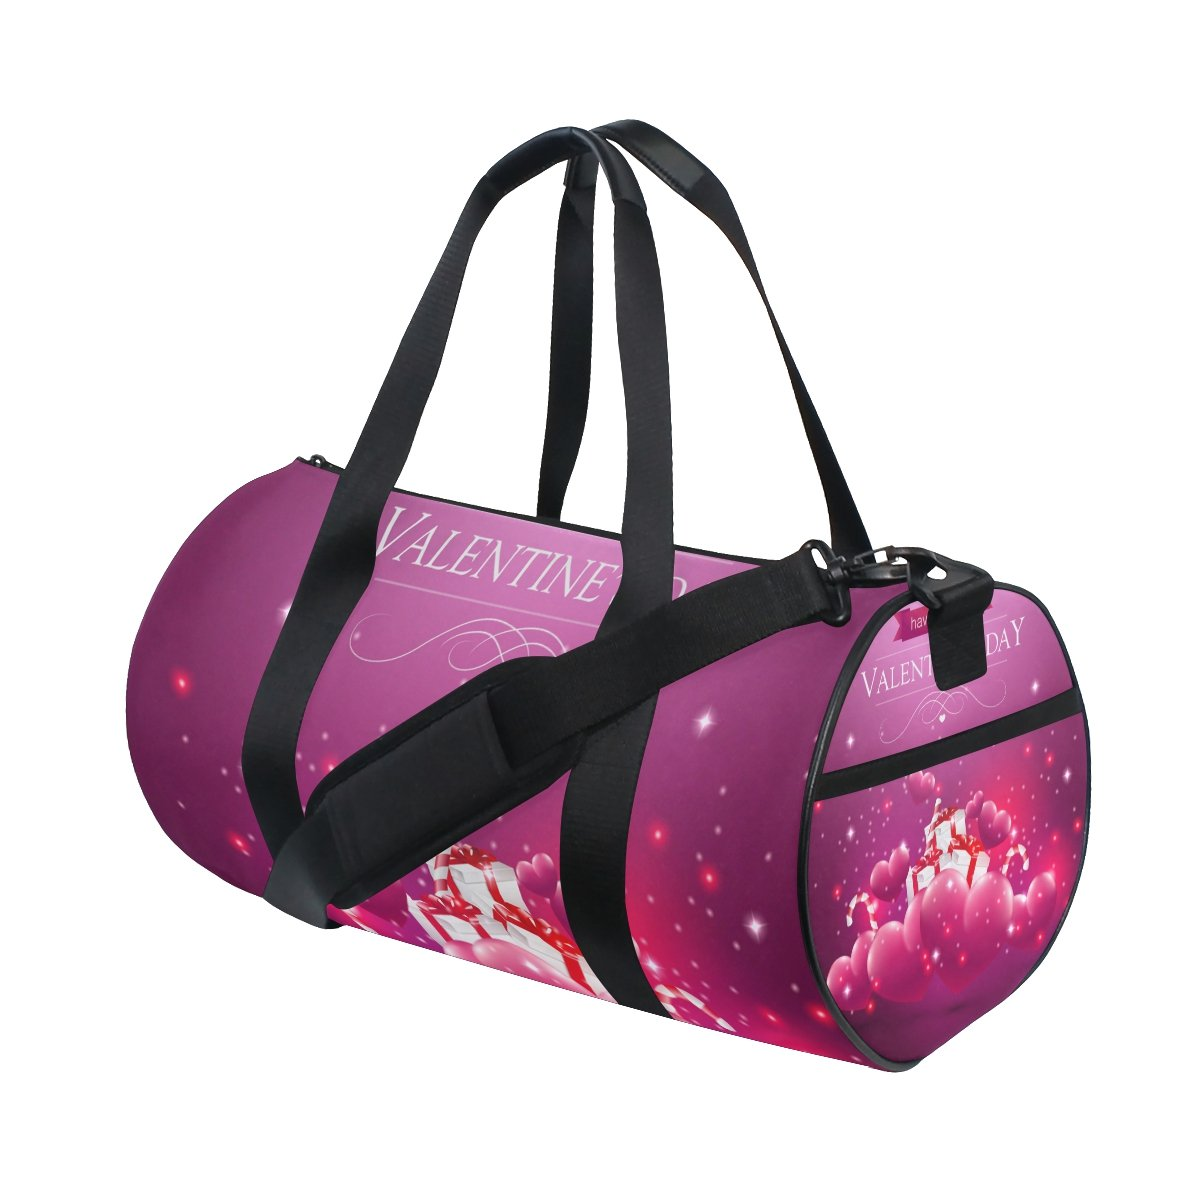 U LIFE Happy Valentines Day February 14Th Love Heart Sports Gym Shoulder Handy Duffel Bags for Women Men Kids Boys Girls